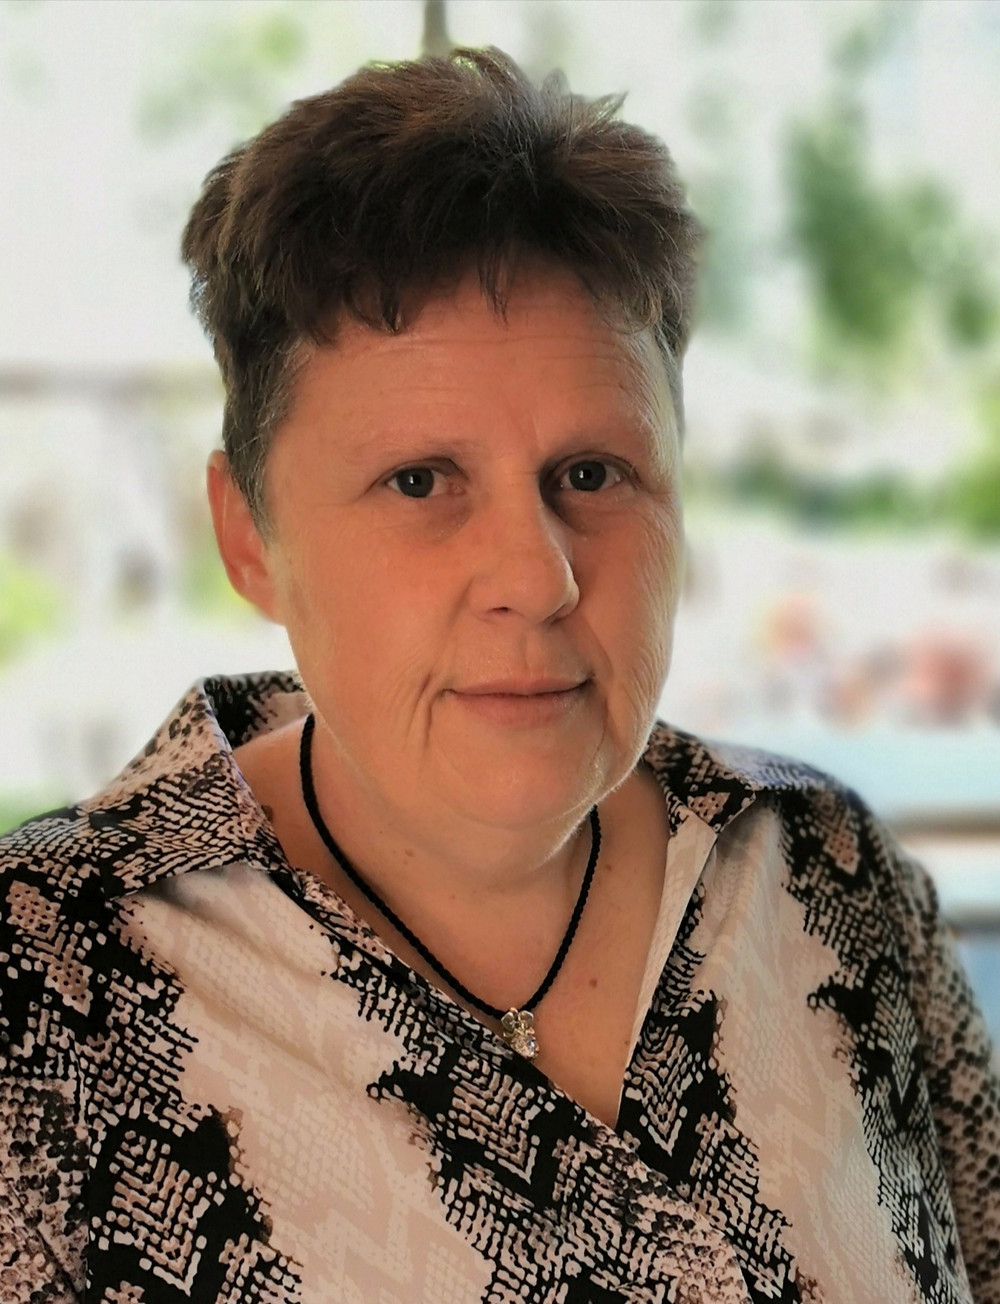 Charlene Sunkel - The Empathy & Hope Project